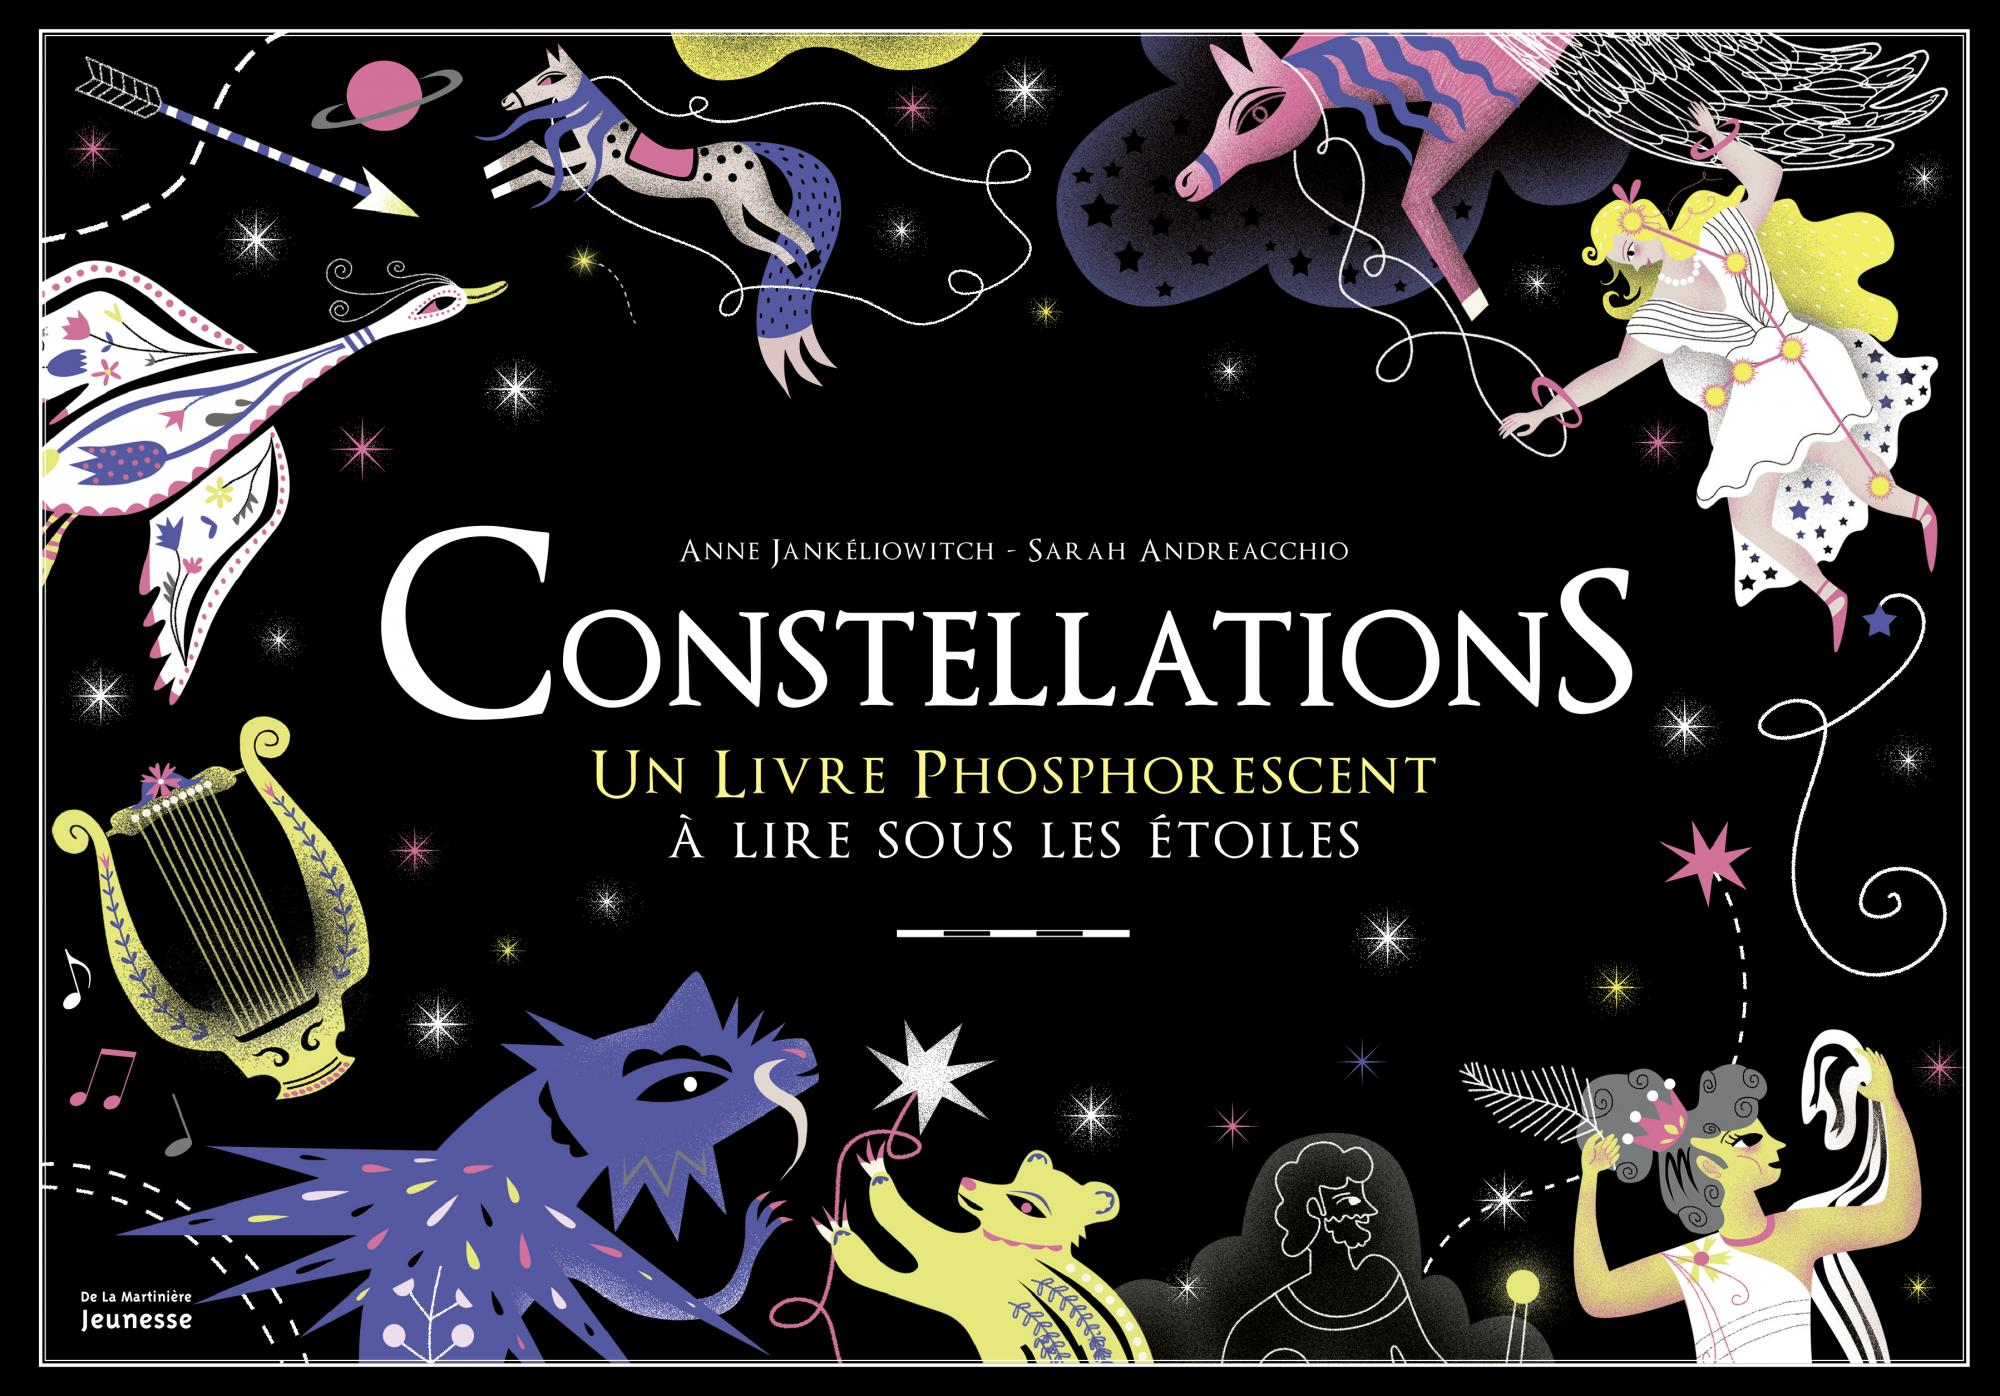 histoire des constellations